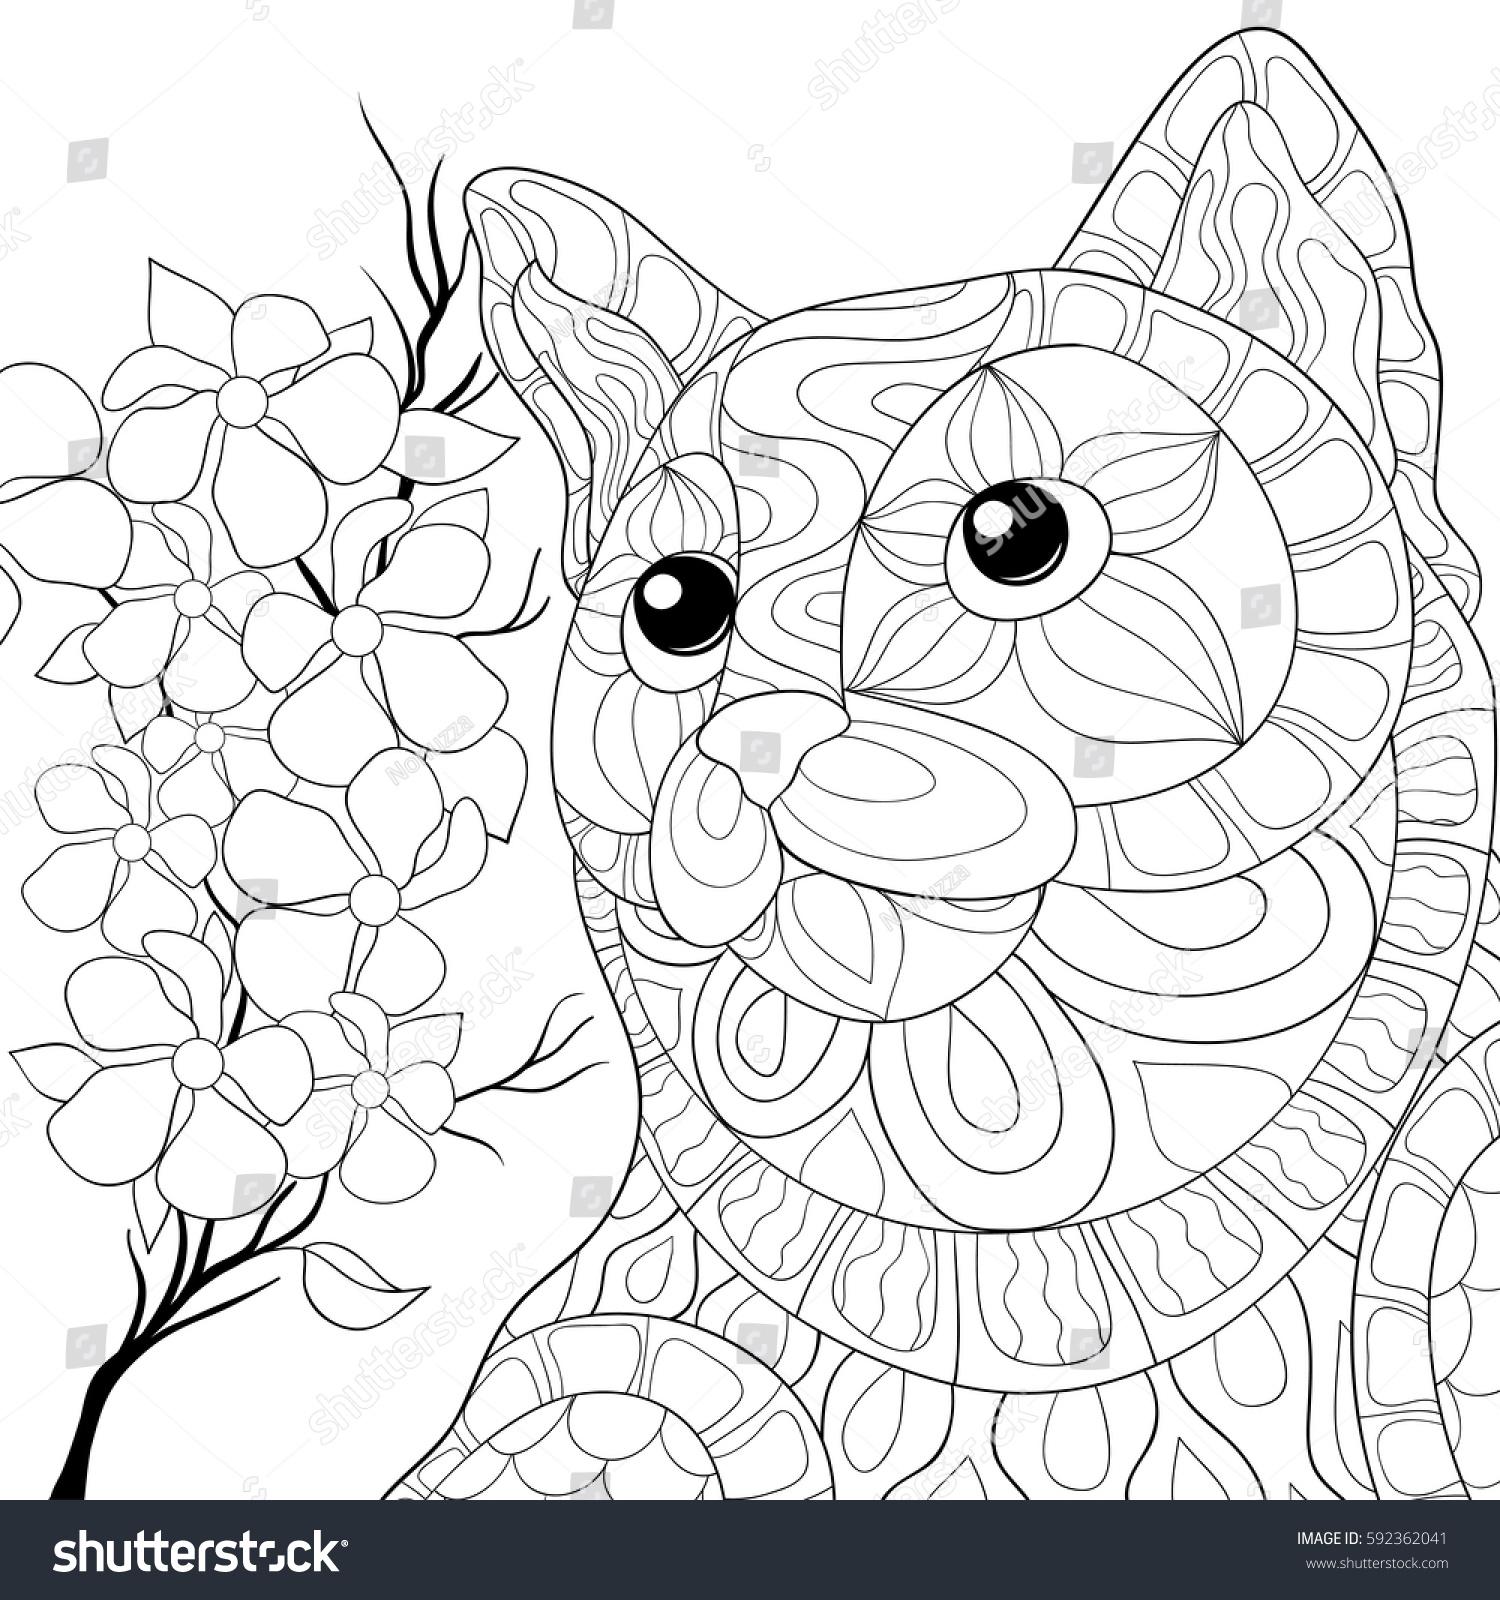 Adult Coloring Book CatZen Art Styledoodle